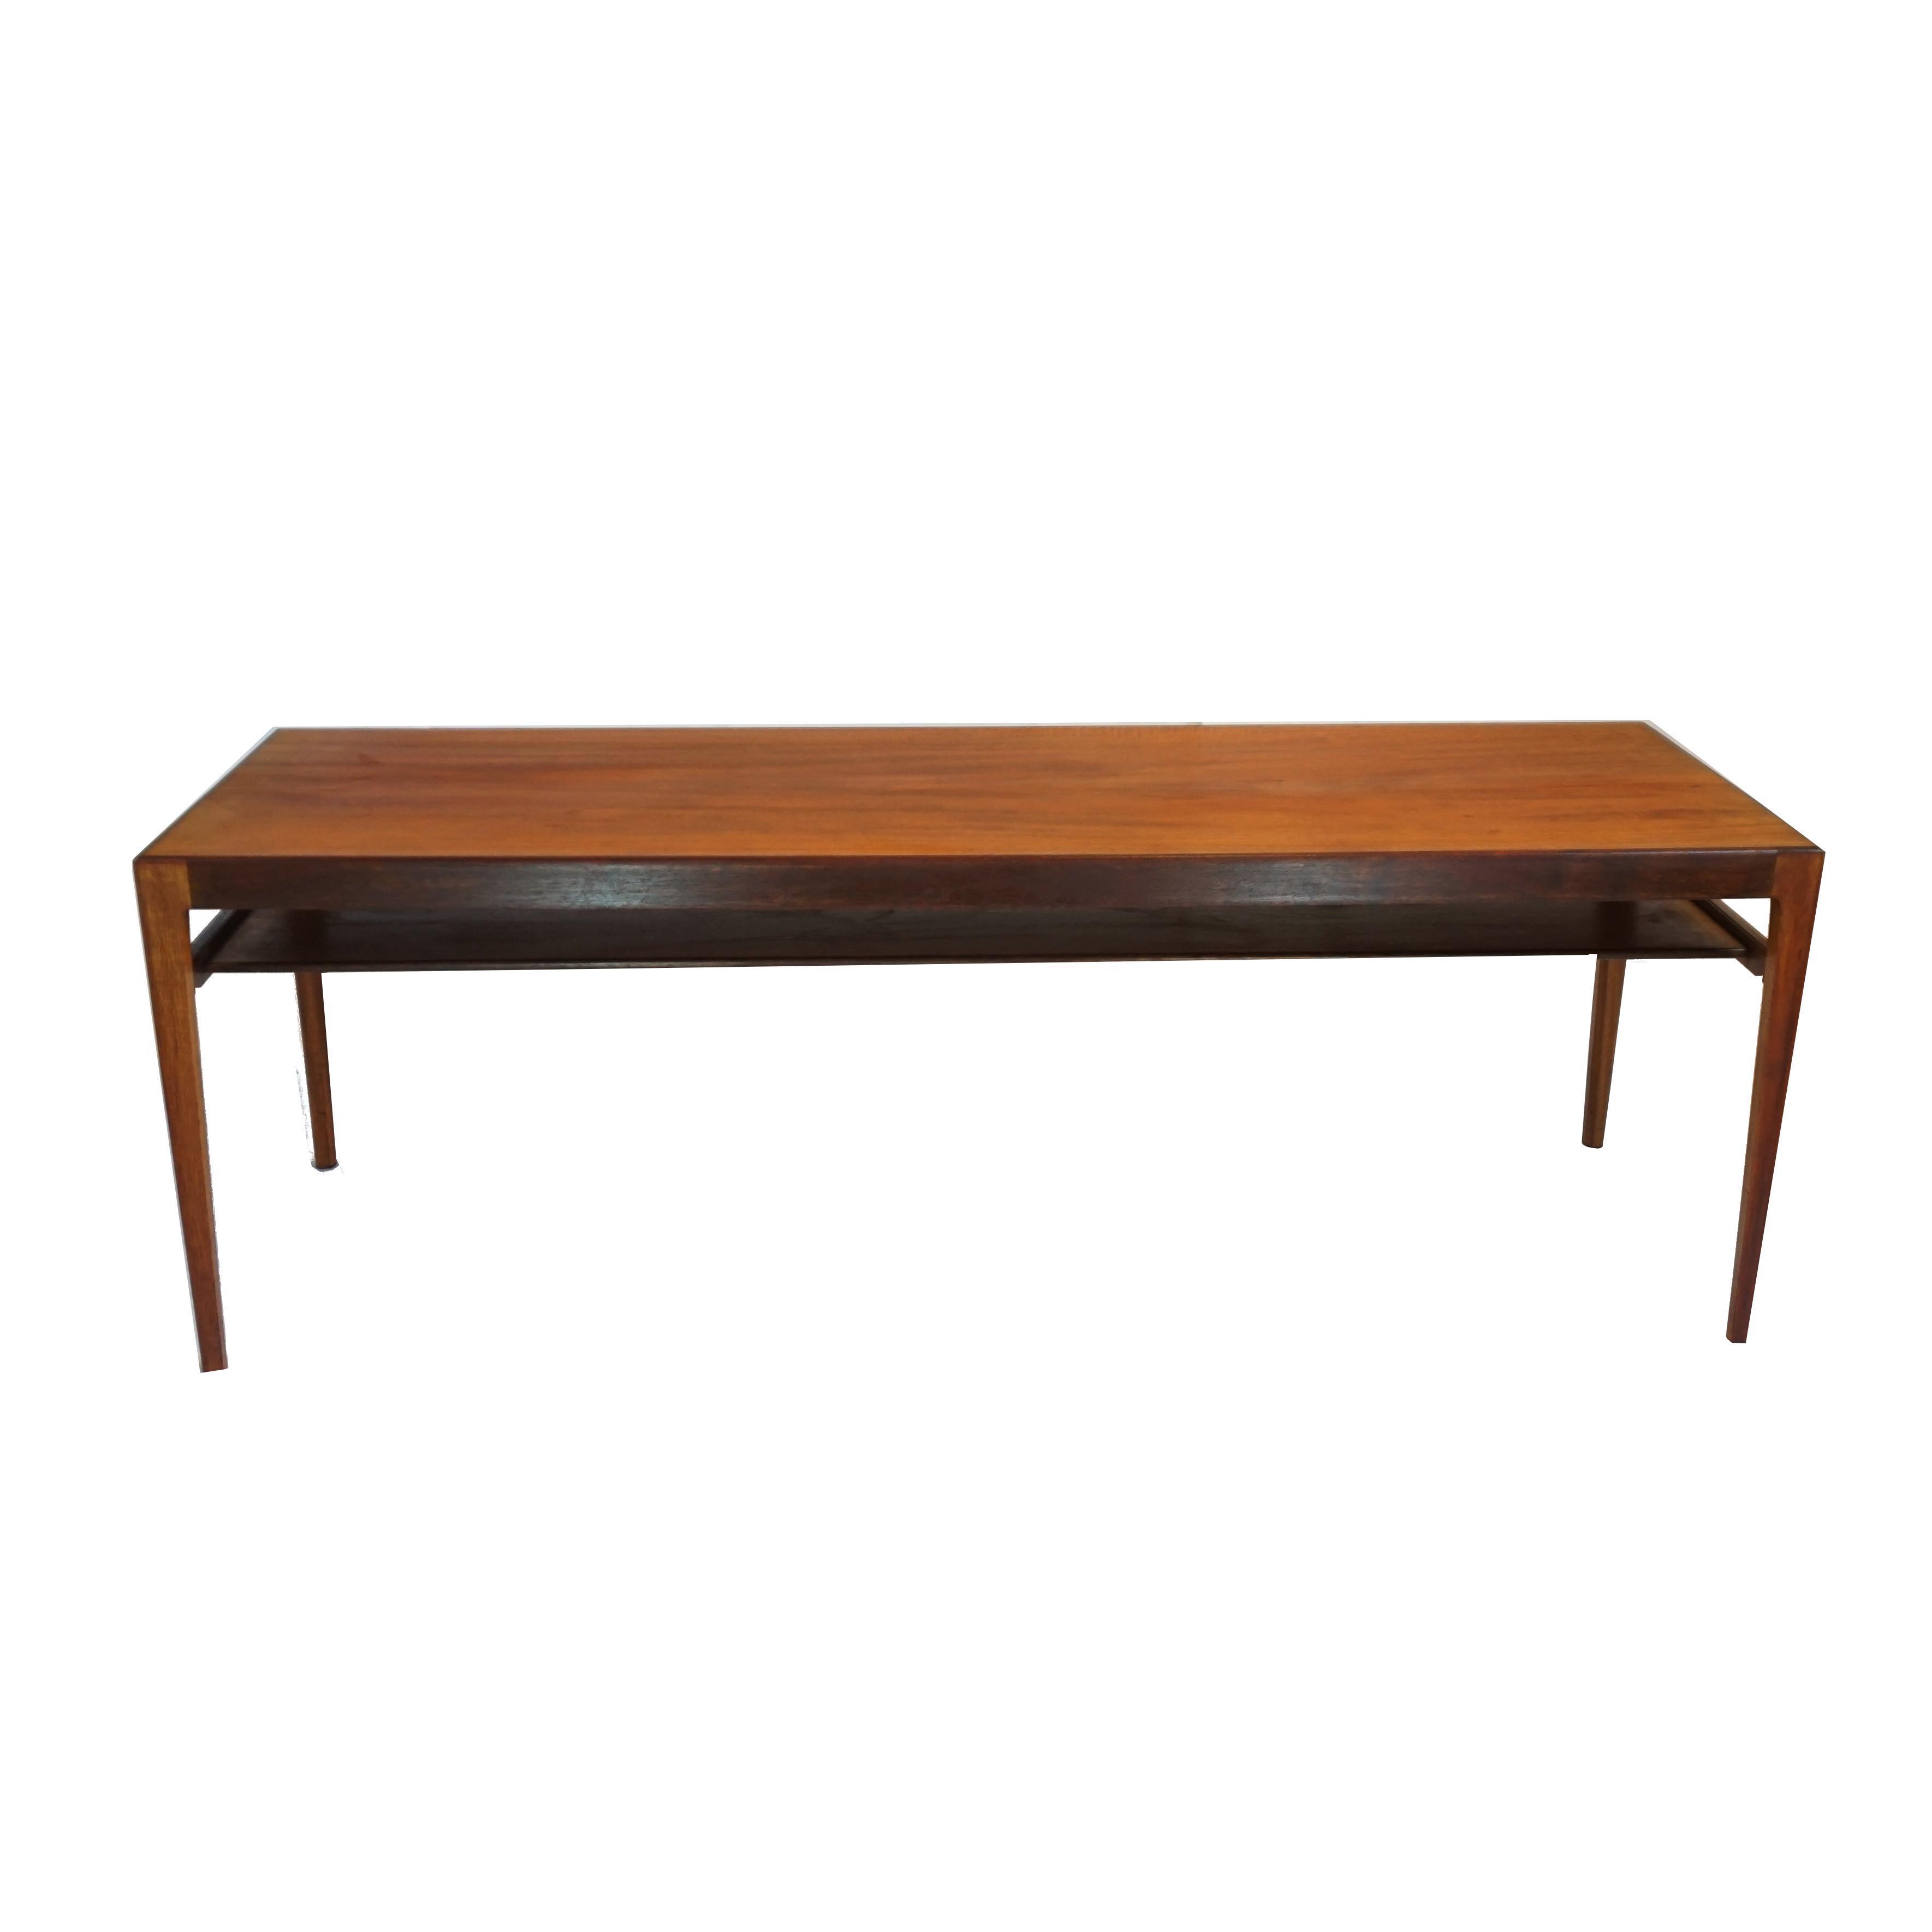 Ludvig pontoppidan teak rosewood long coffee table chairish geotapseo Choice Image